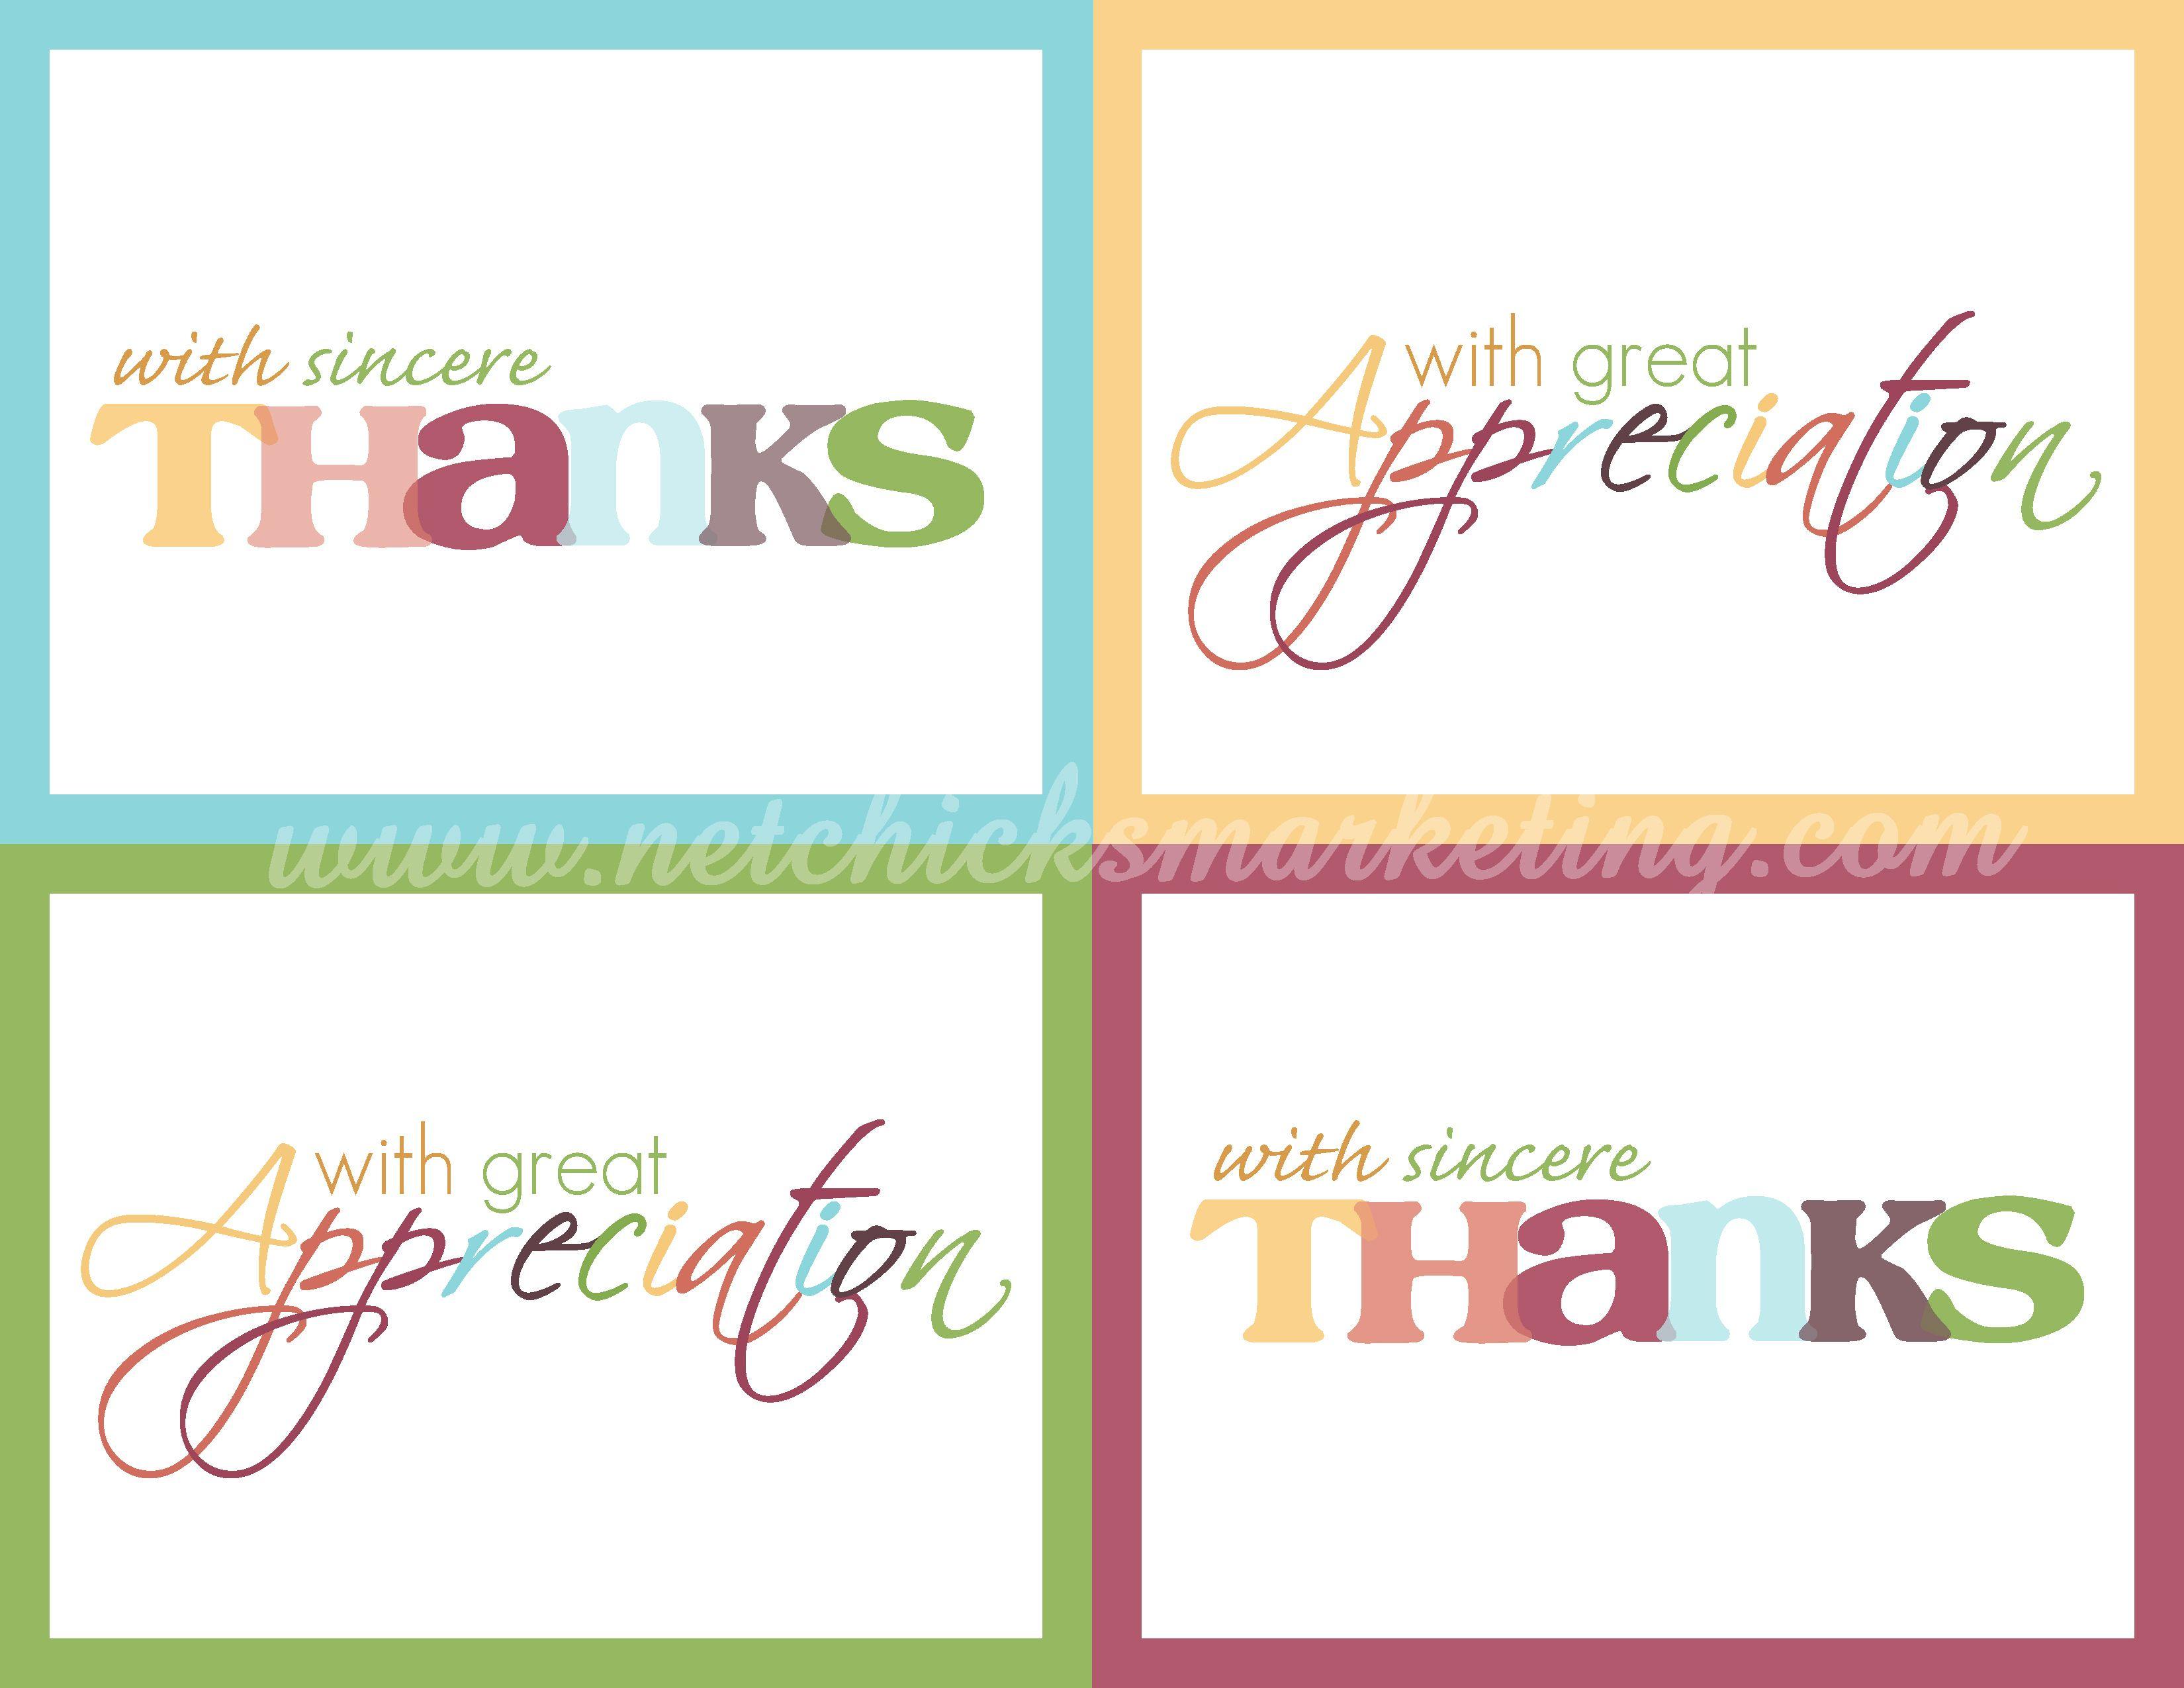 Image Result For Postcards Free Printable | Cards | Printable Thank - Free Printable Thank You Cards